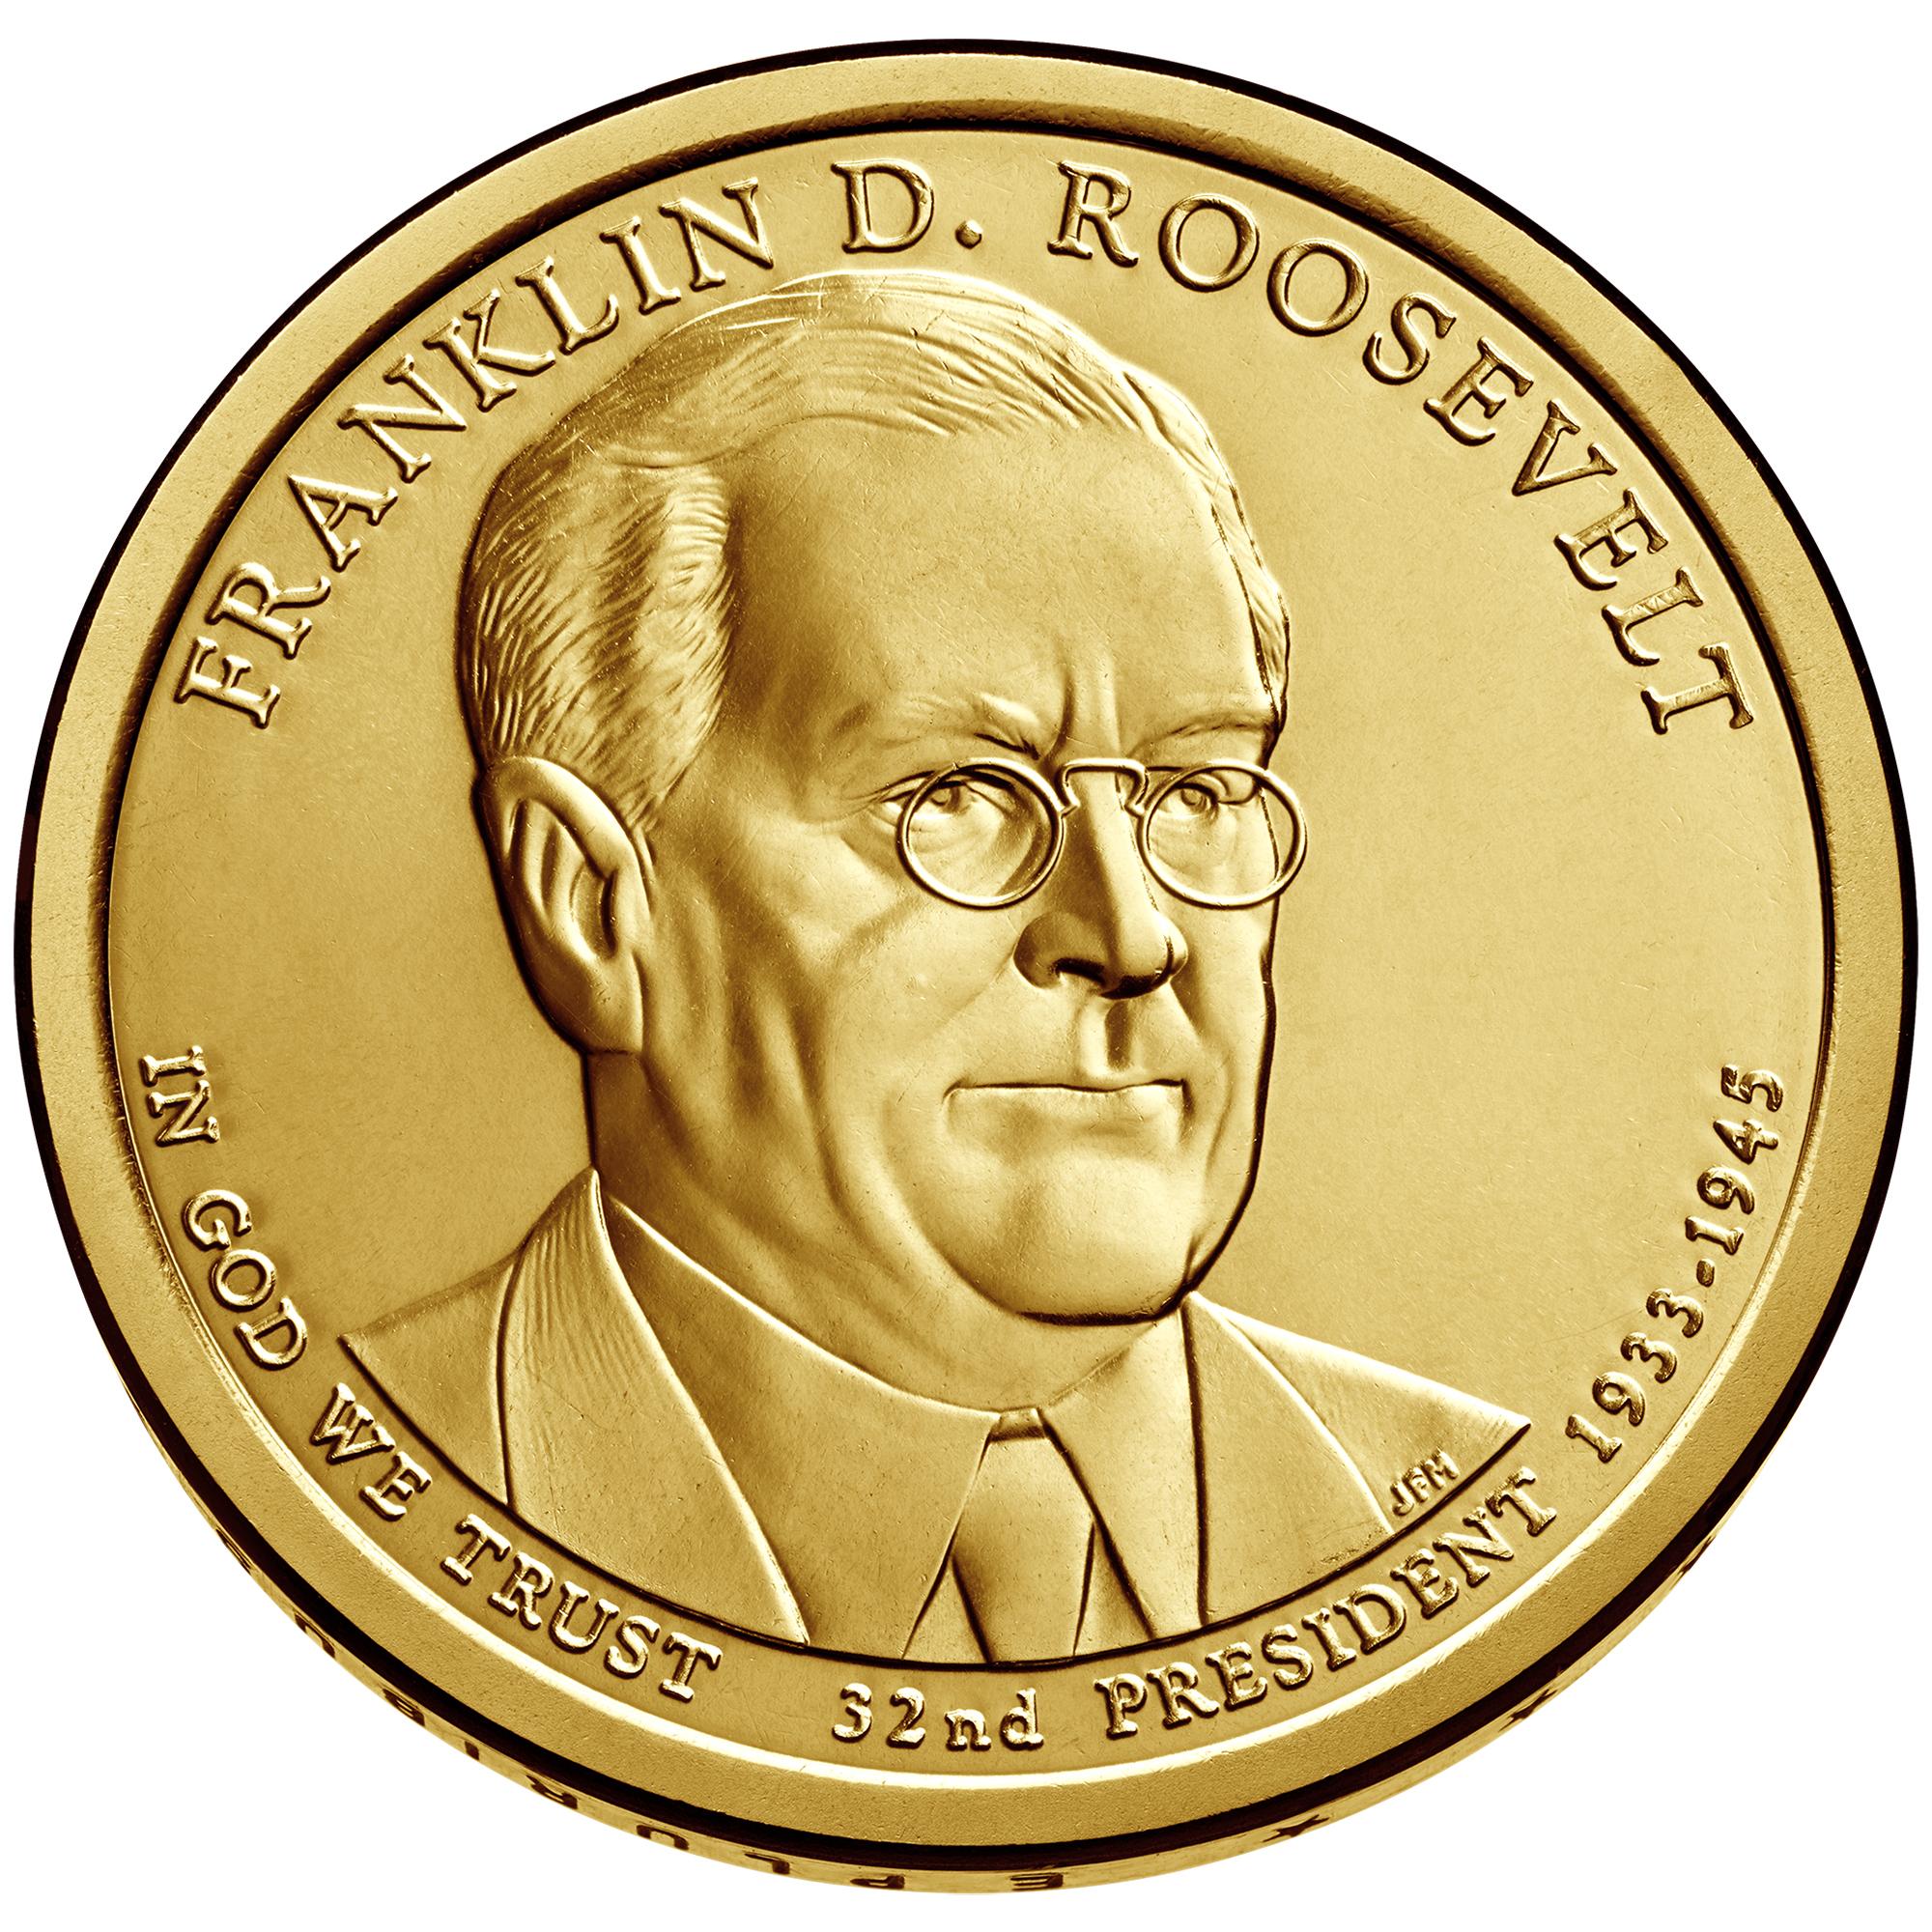 2014 Presidential Dollar Coin Franklin D. Roosevelt Uncirculated Obverse